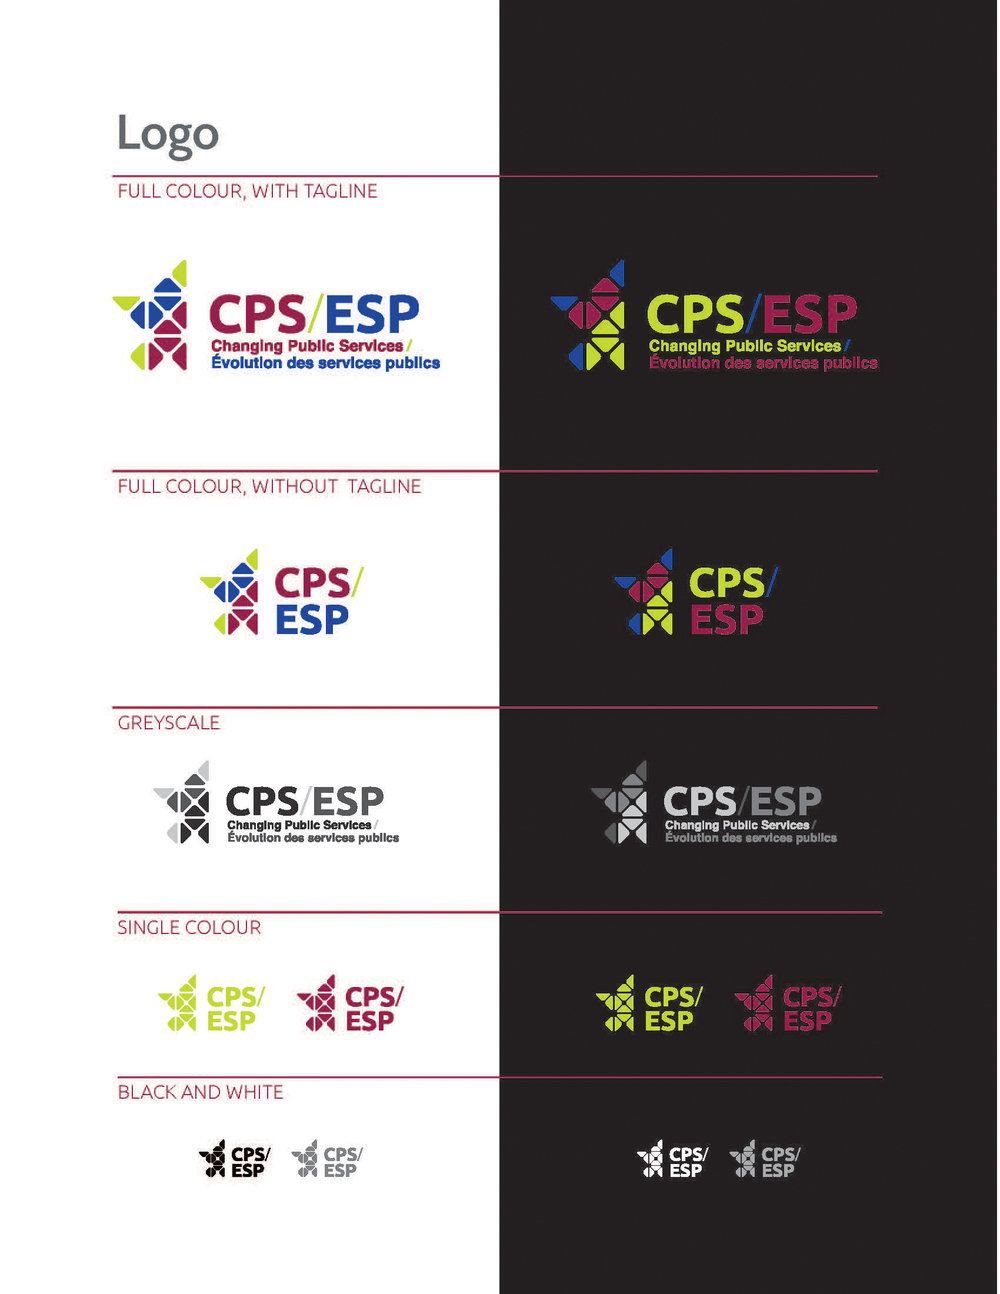 2015-07-10-CPSESP-Brandguide_Page_2.jpg